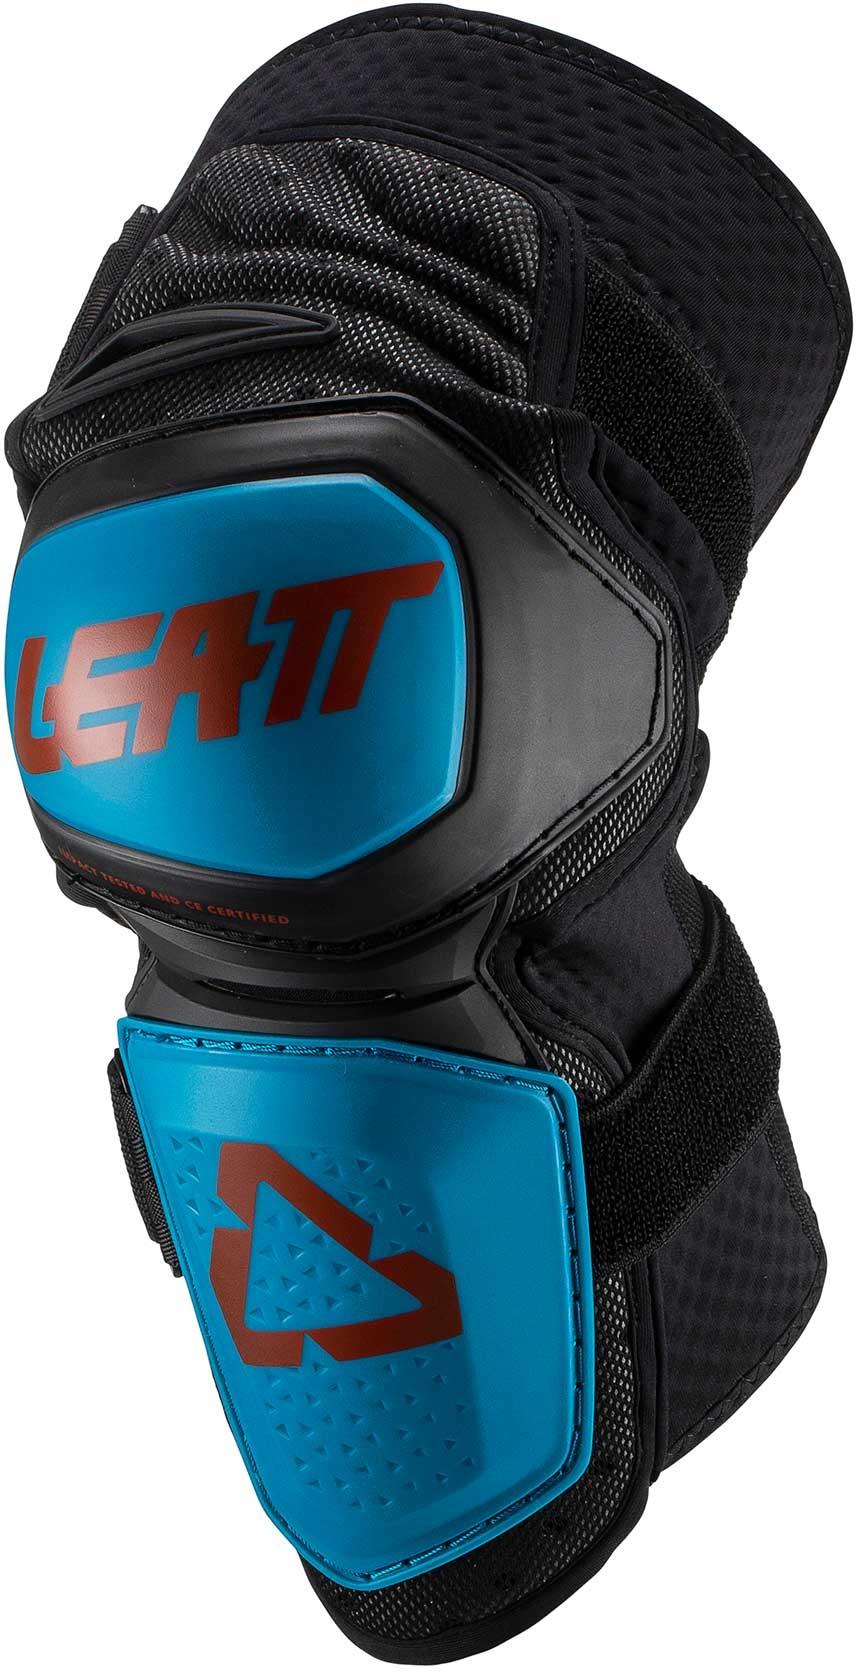 Motocross Dirtbike OffroadPair Leatt Enduro Knee Guards